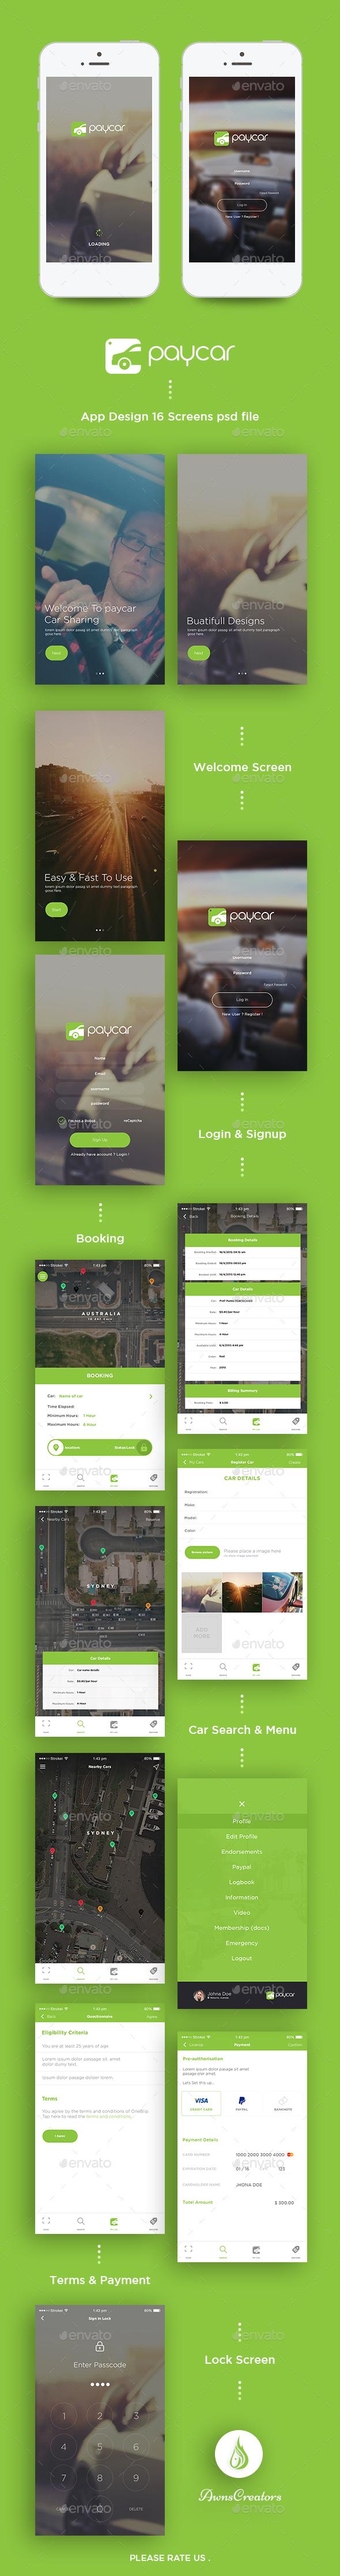 Paycar App UI Kit (User Interfaces)